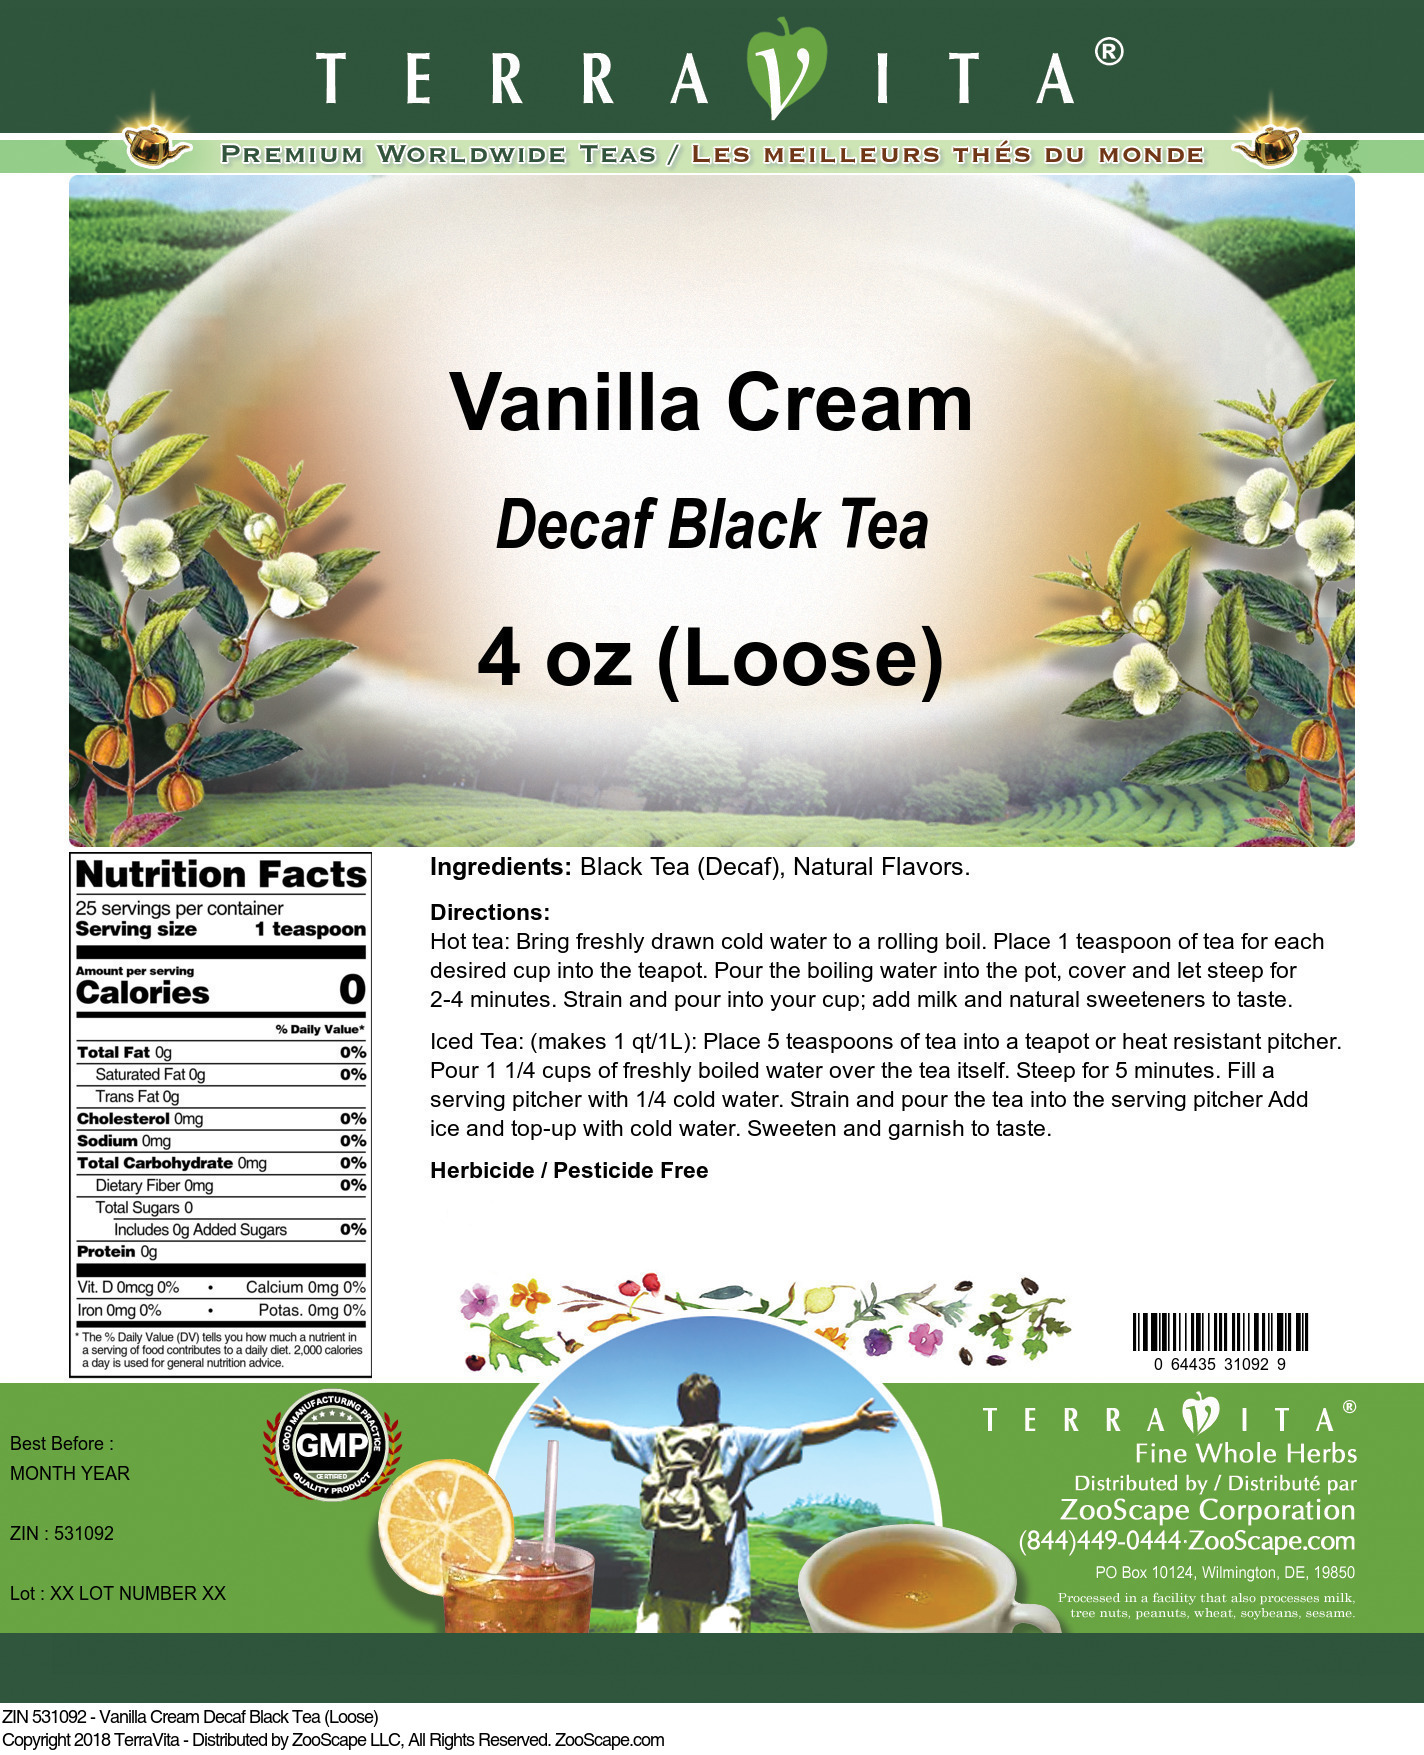 Vanilla Cream Decaf Black Tea (Loose)